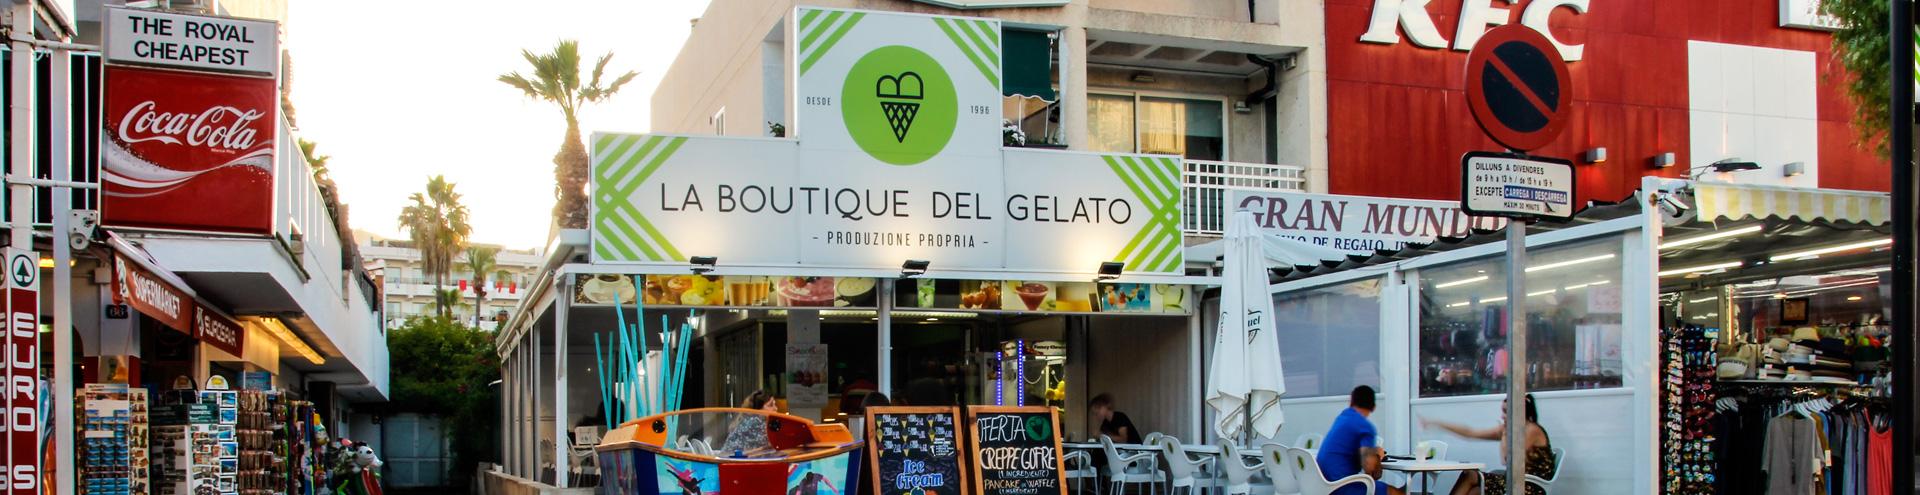 La Boutique del Gelato Alcudia